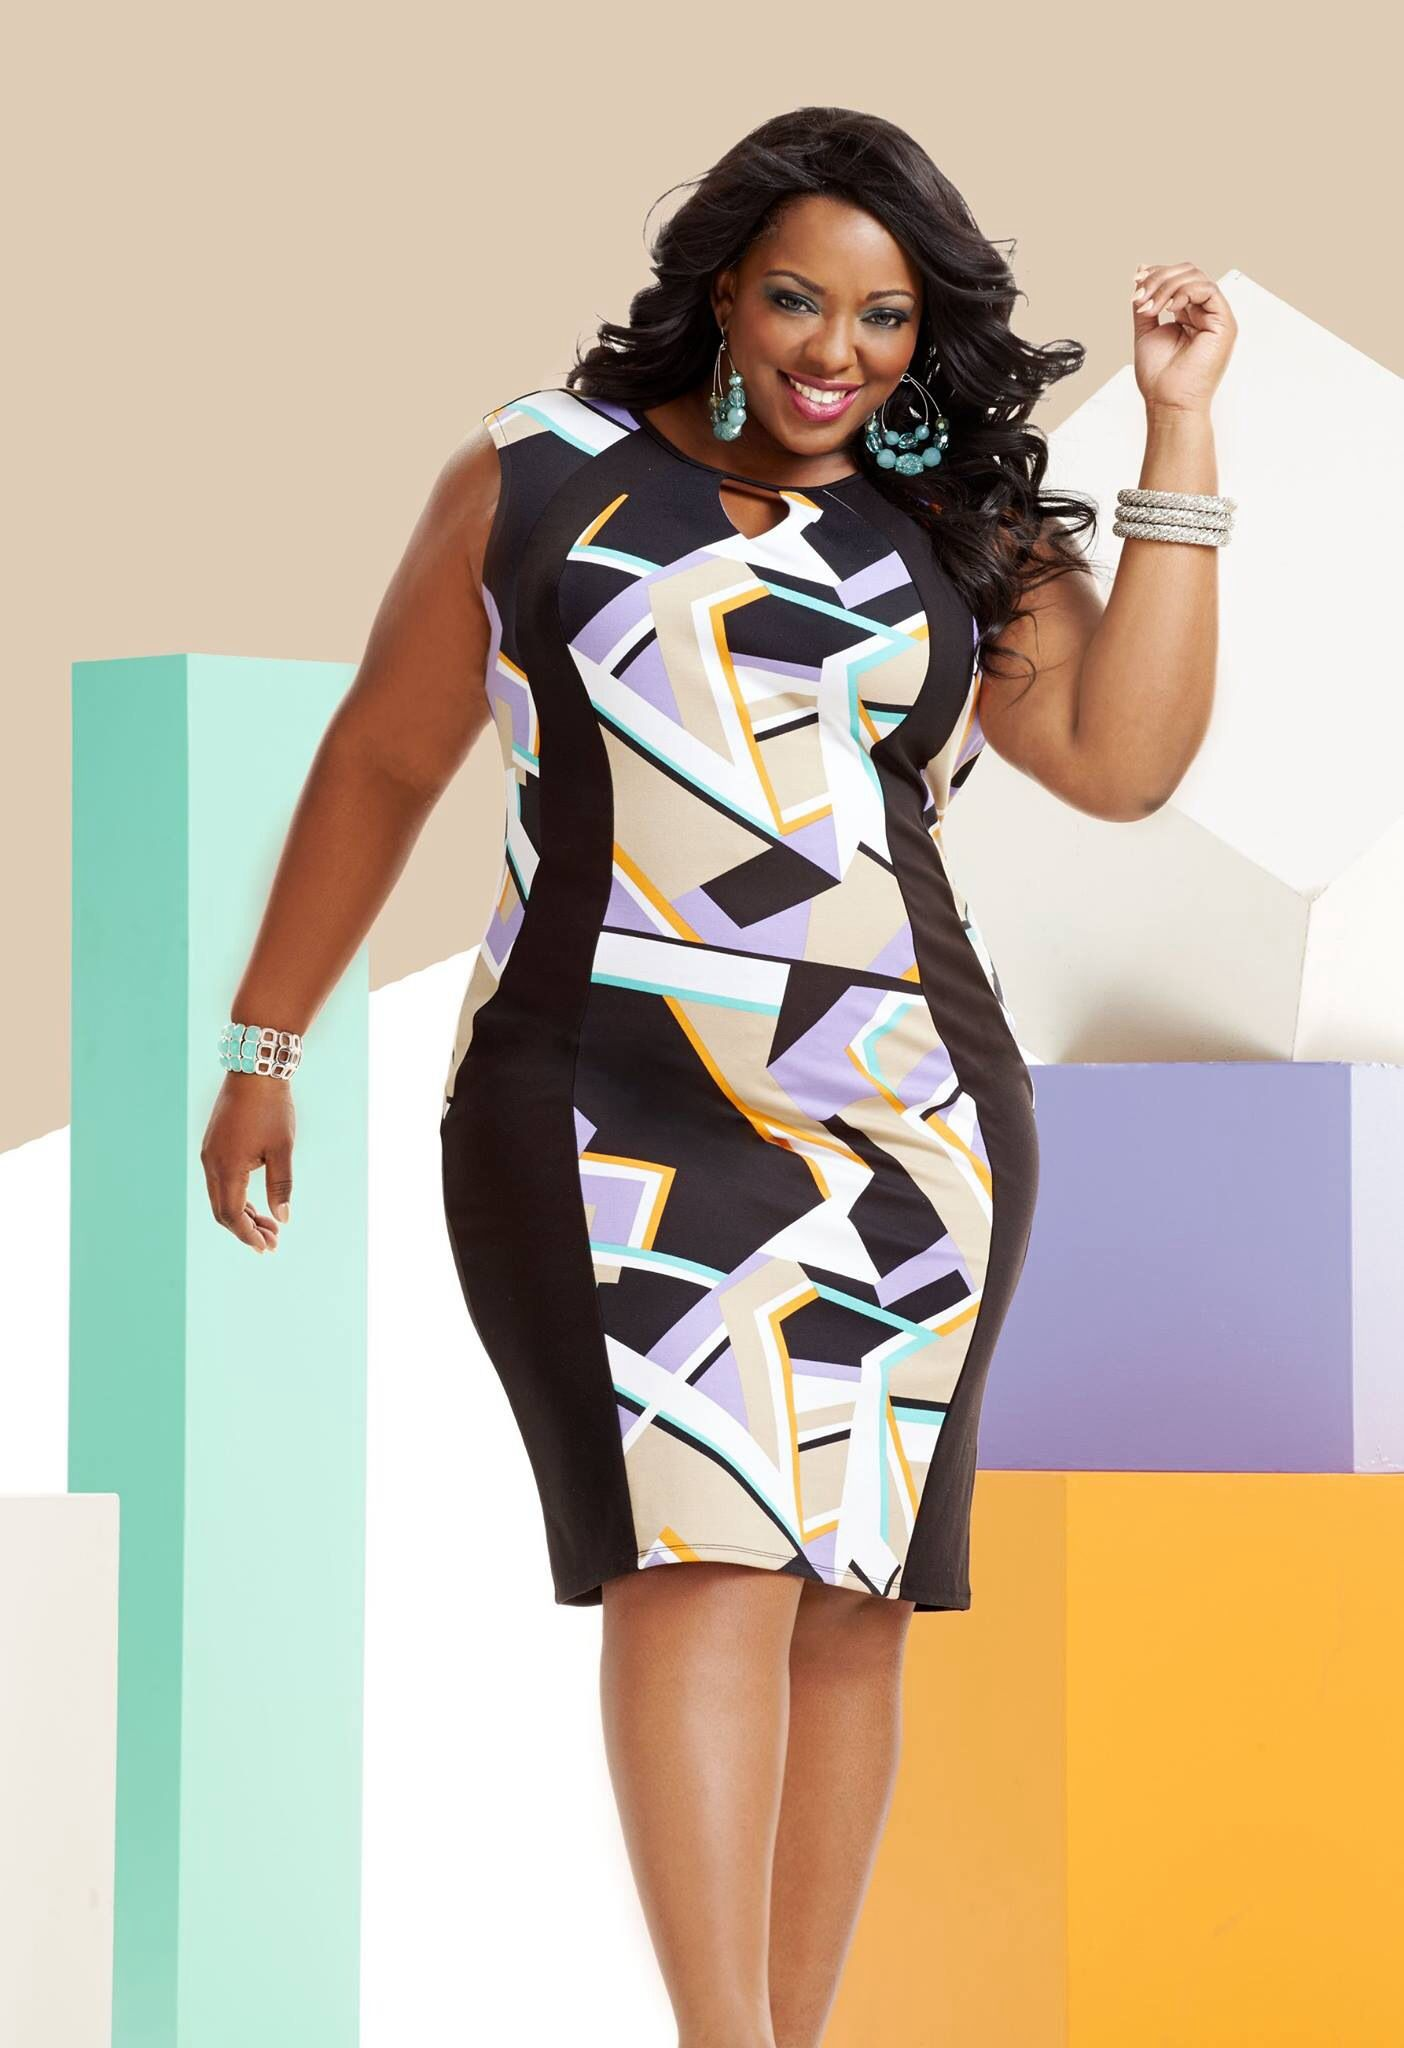 cuerpo triangular plus size outfit mode f r frauen. Black Bedroom Furniture Sets. Home Design Ideas